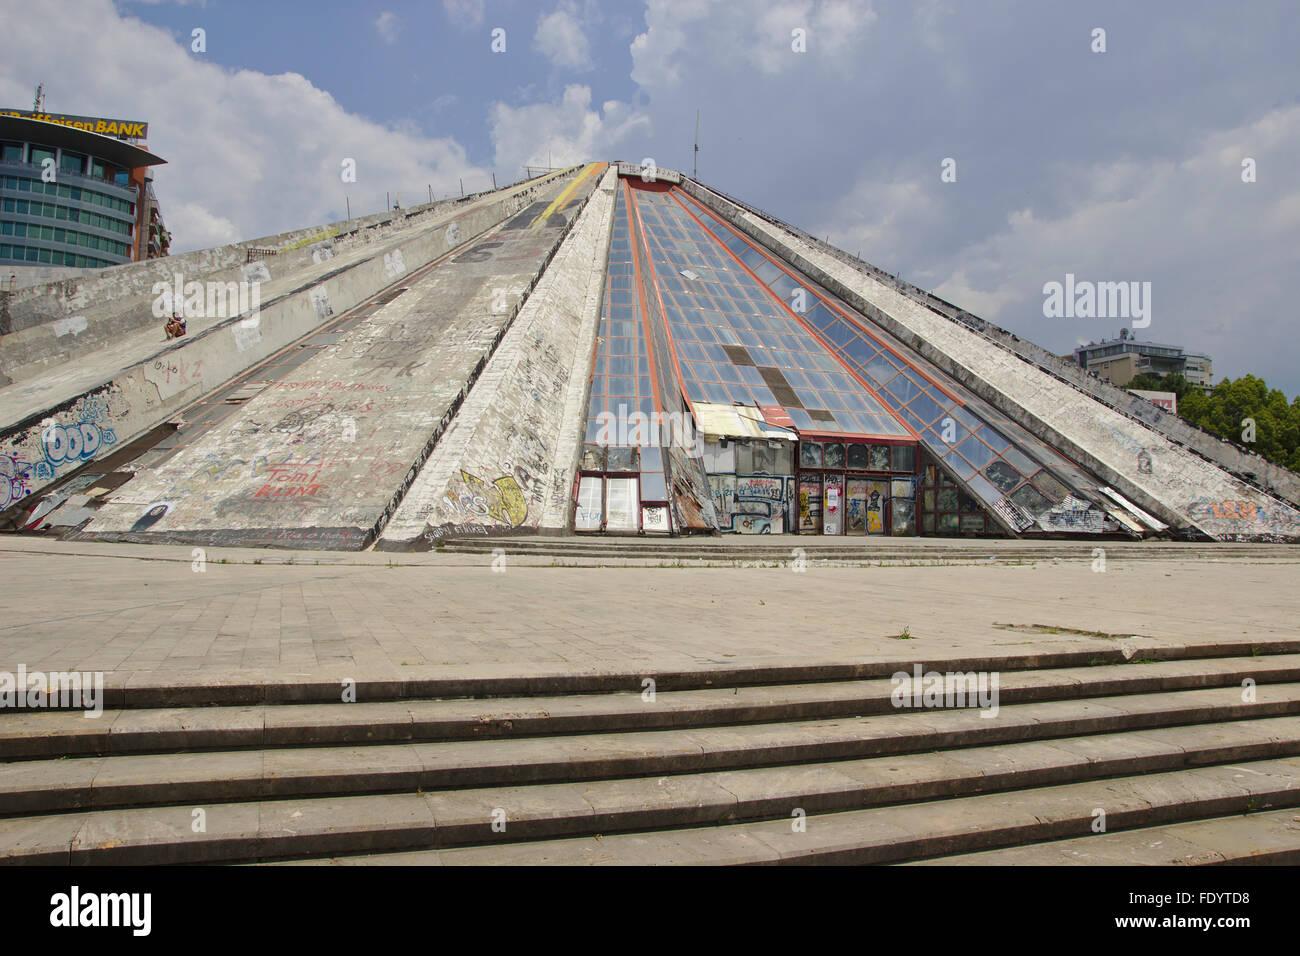 'Pyramid', former Enver Hoxha Museum, Tirana, Albanien - Stock Image